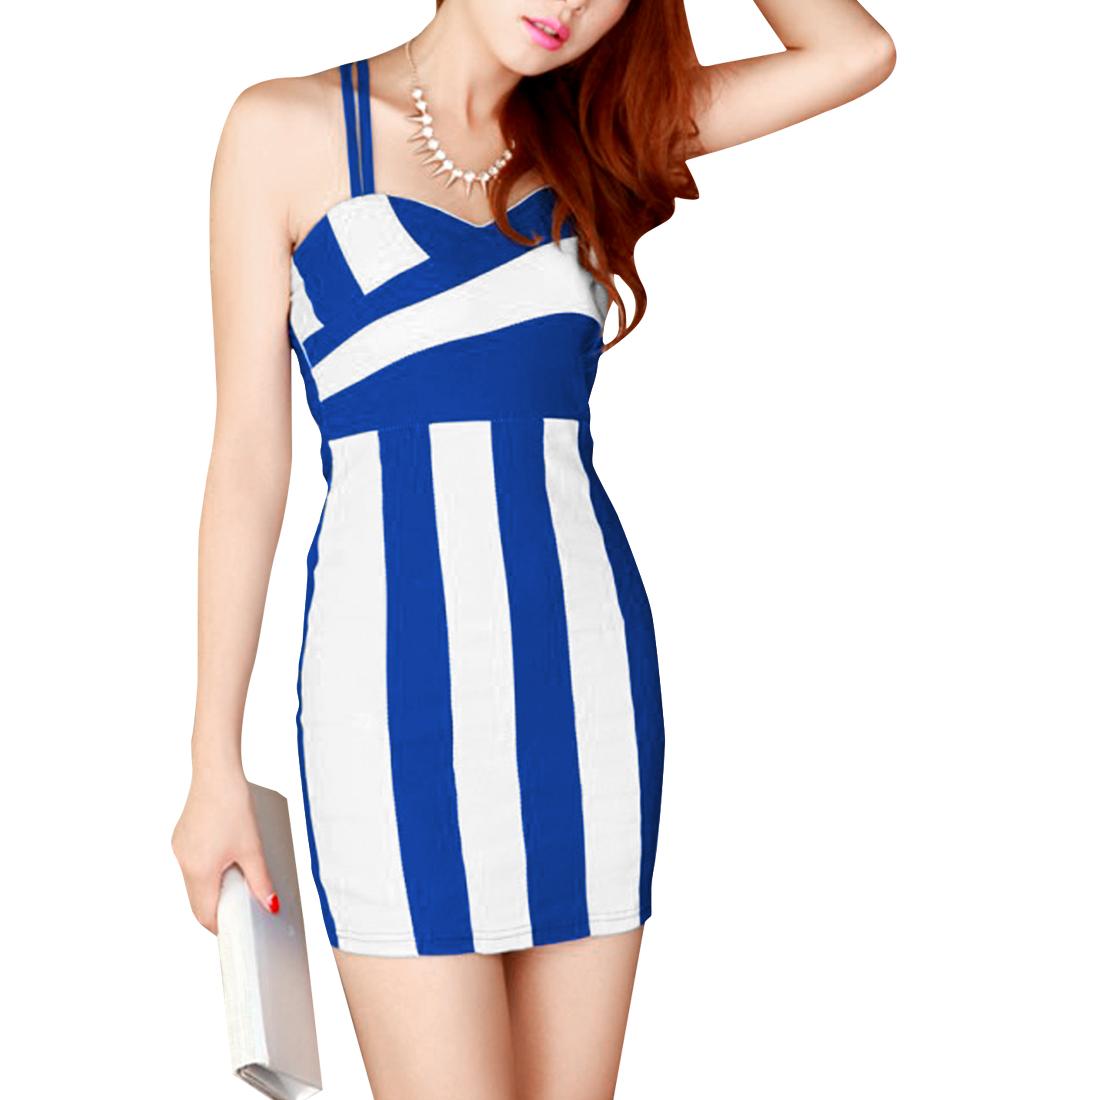 Women Crossover Shoulder Strap Sheath Dress Blue White XS